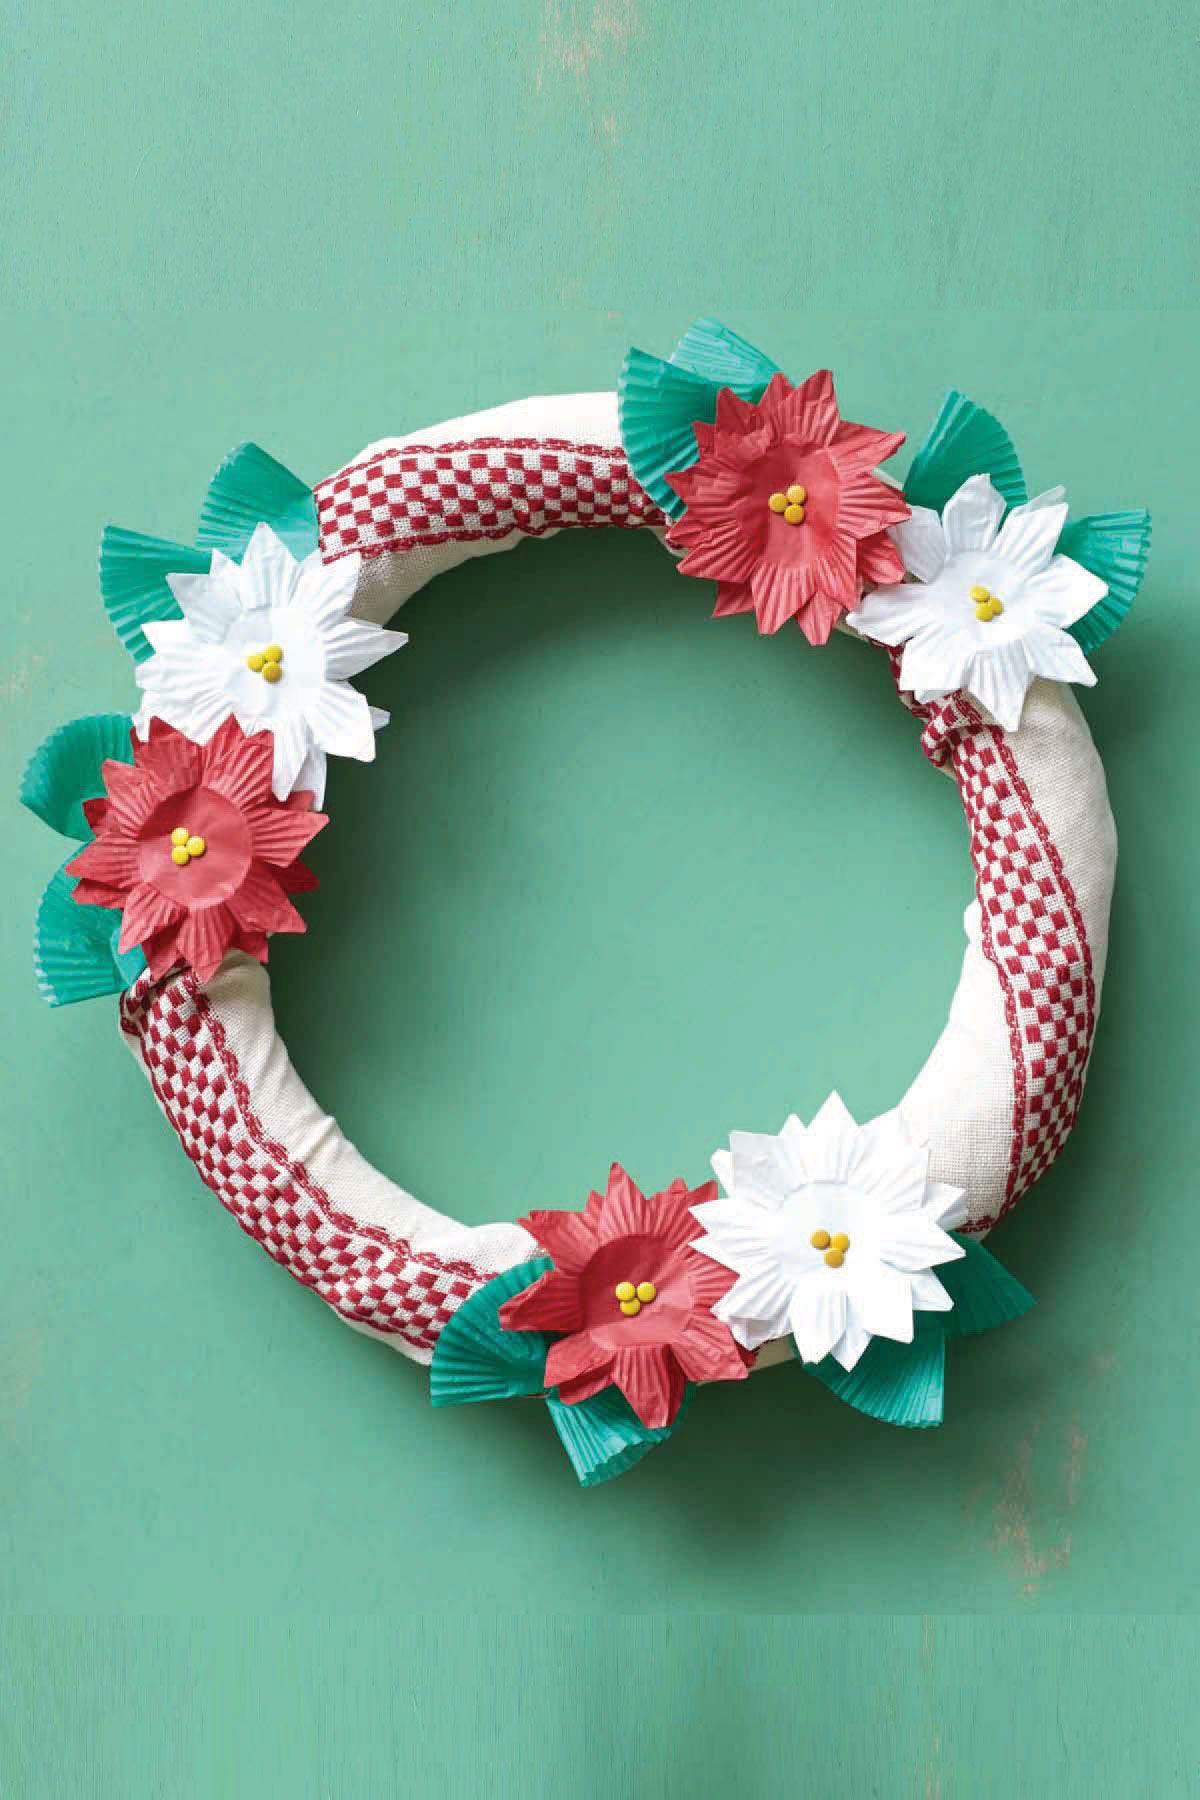 50 diy christmas wreath ideas how to make holiday wreaths crafts solutioingenieria Gallery